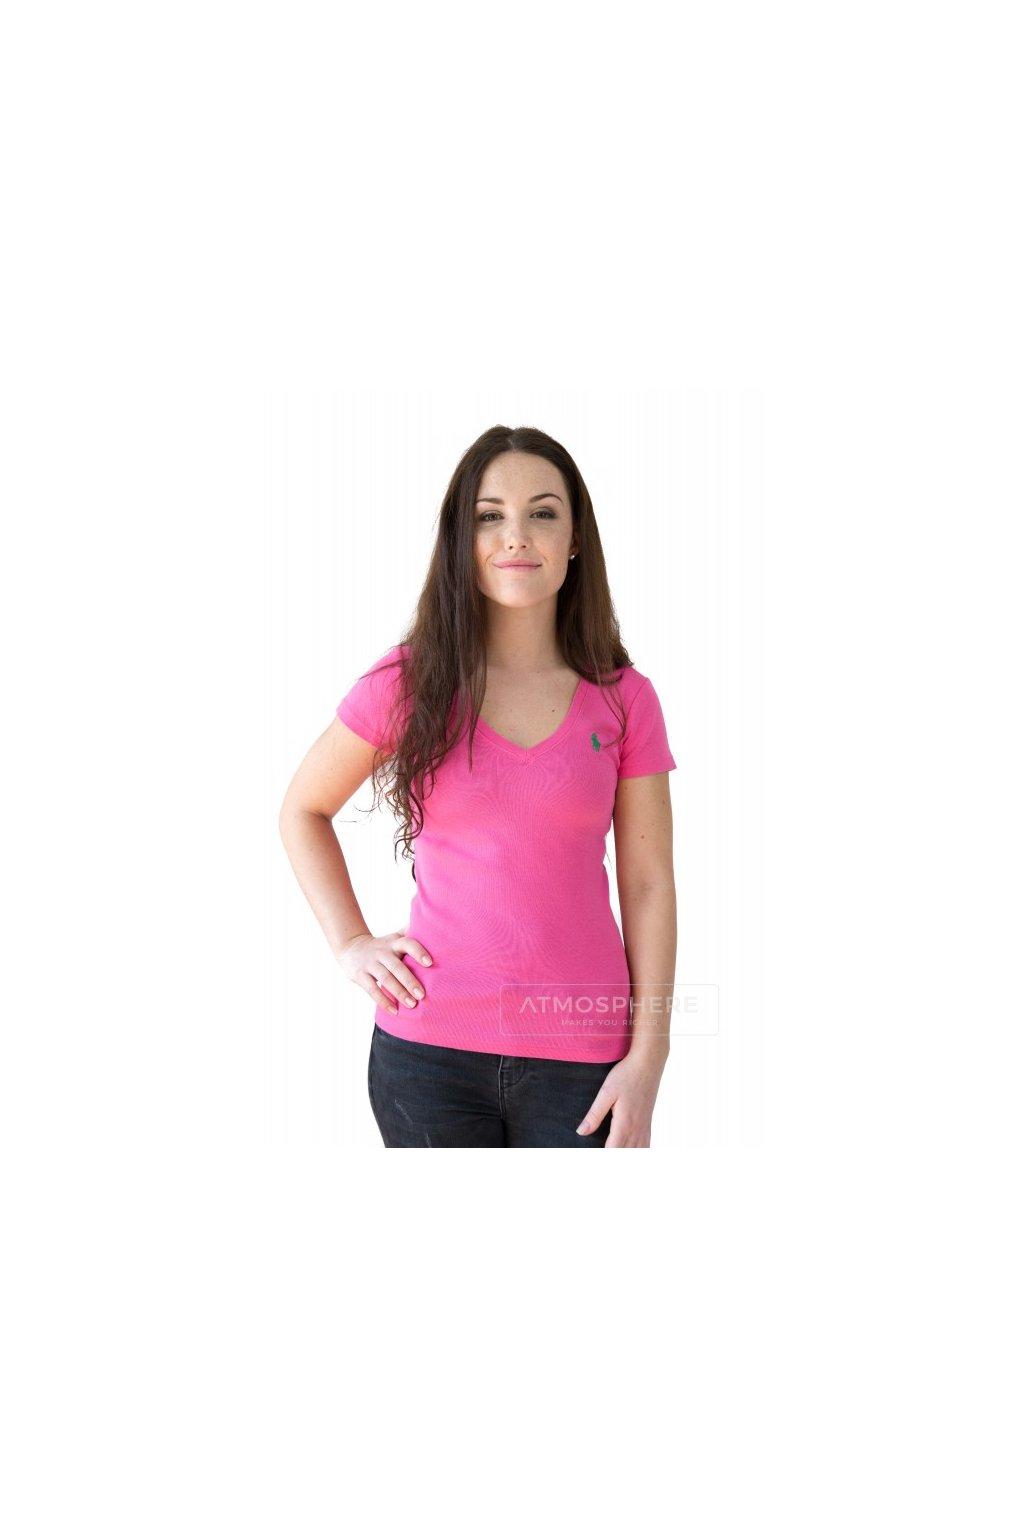 tricko ralph lauren vneck medium pink eshopat cz 1